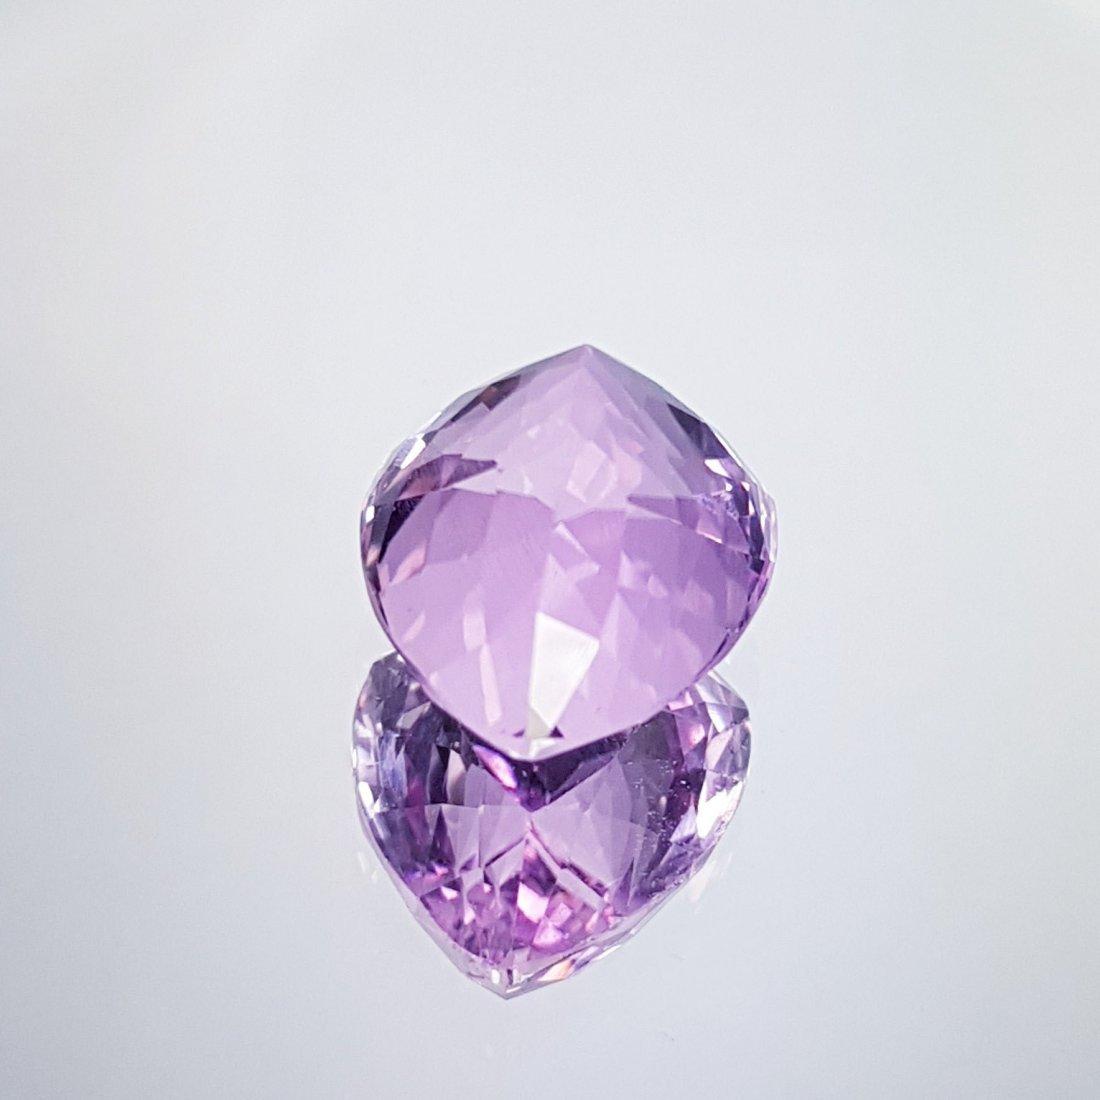 Pink Kunzite - 11.65 ct - 4